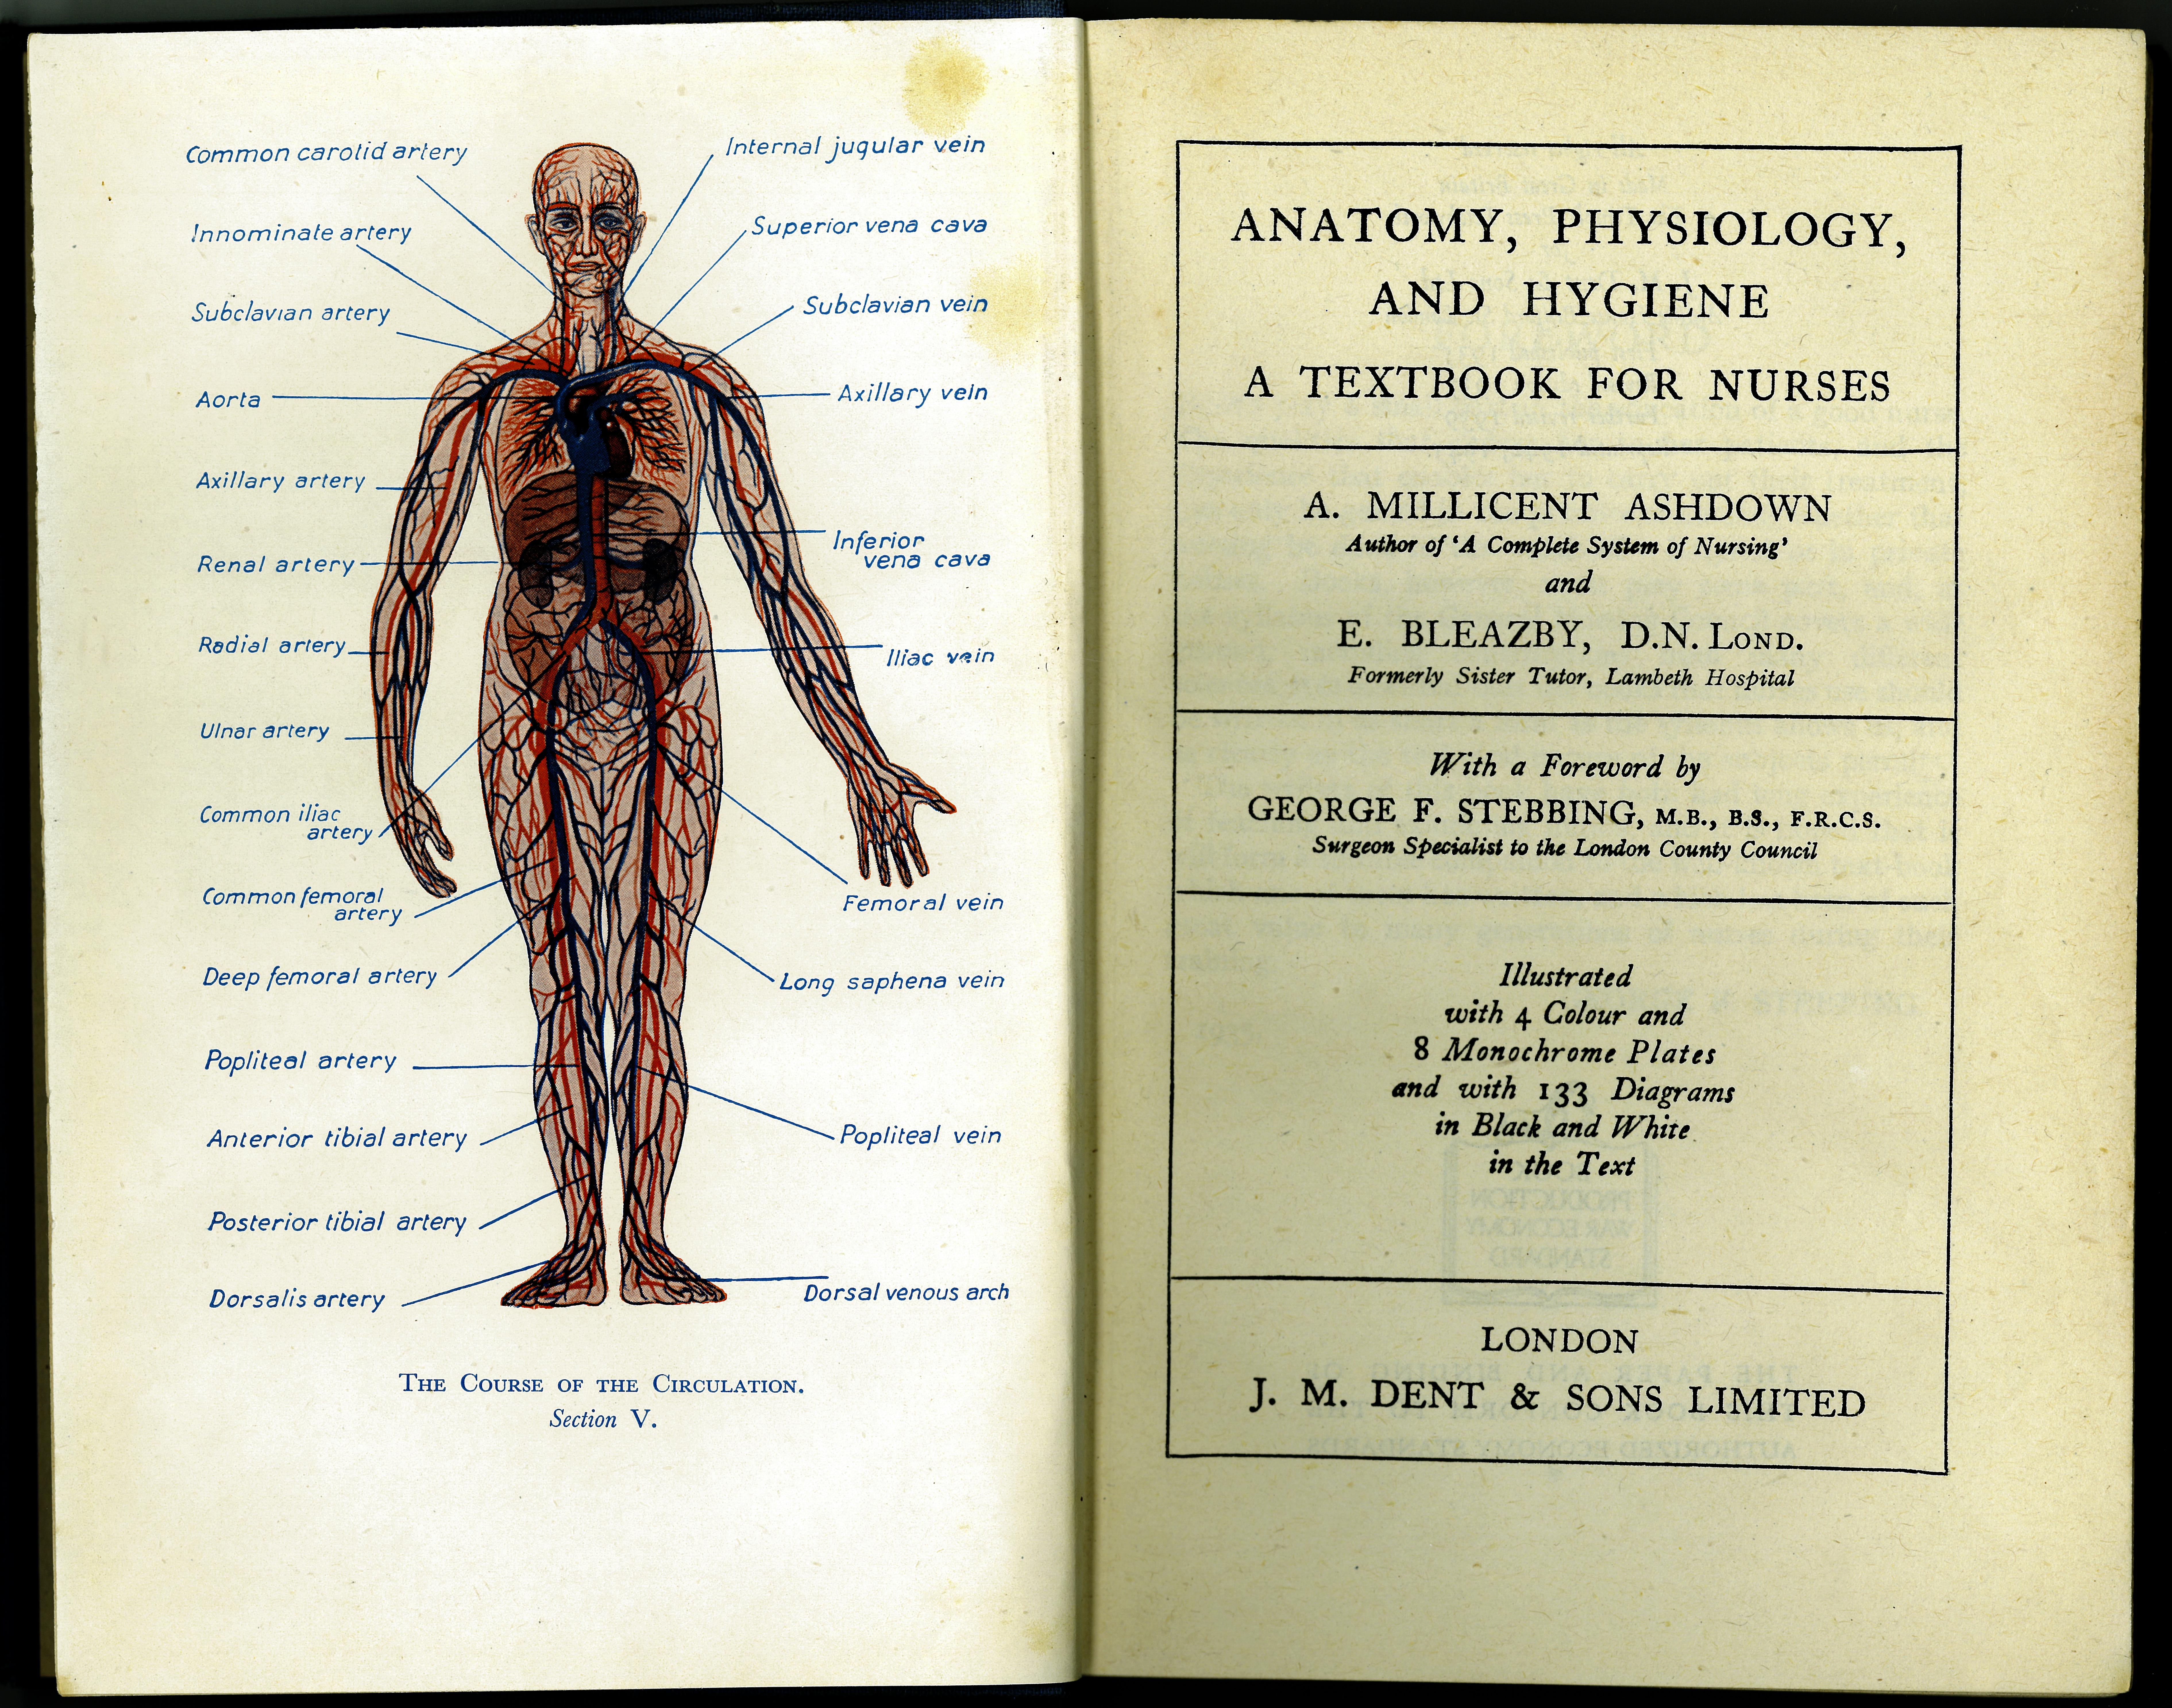 Famous Anatomy And Physiology Tutor Gift - Anatomy Ideas - yunoki.info